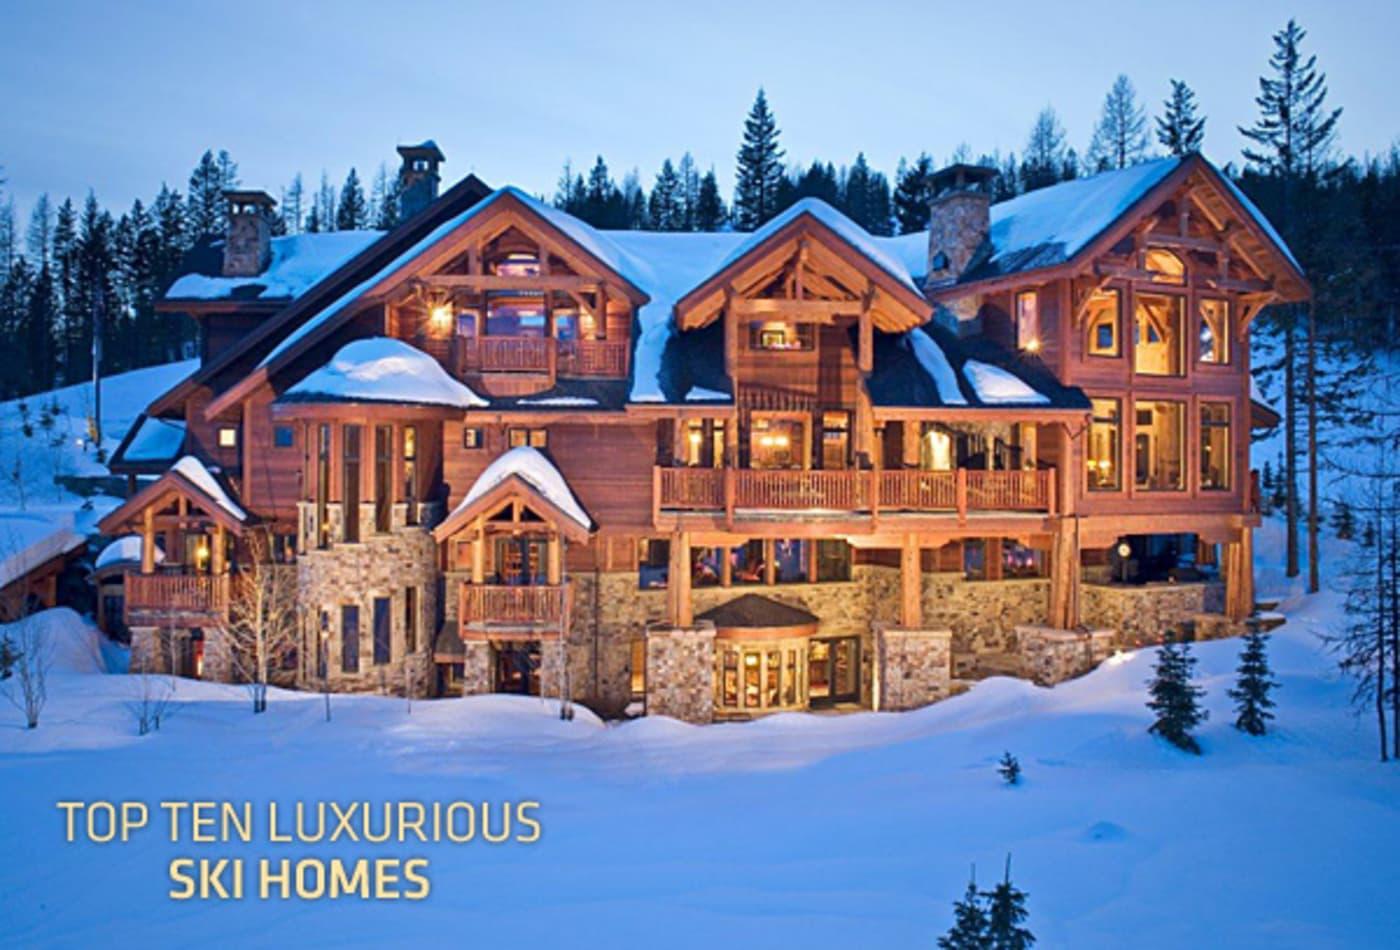 Whitefish-Mountain-Top-Ski-Homes-Cover.jpg